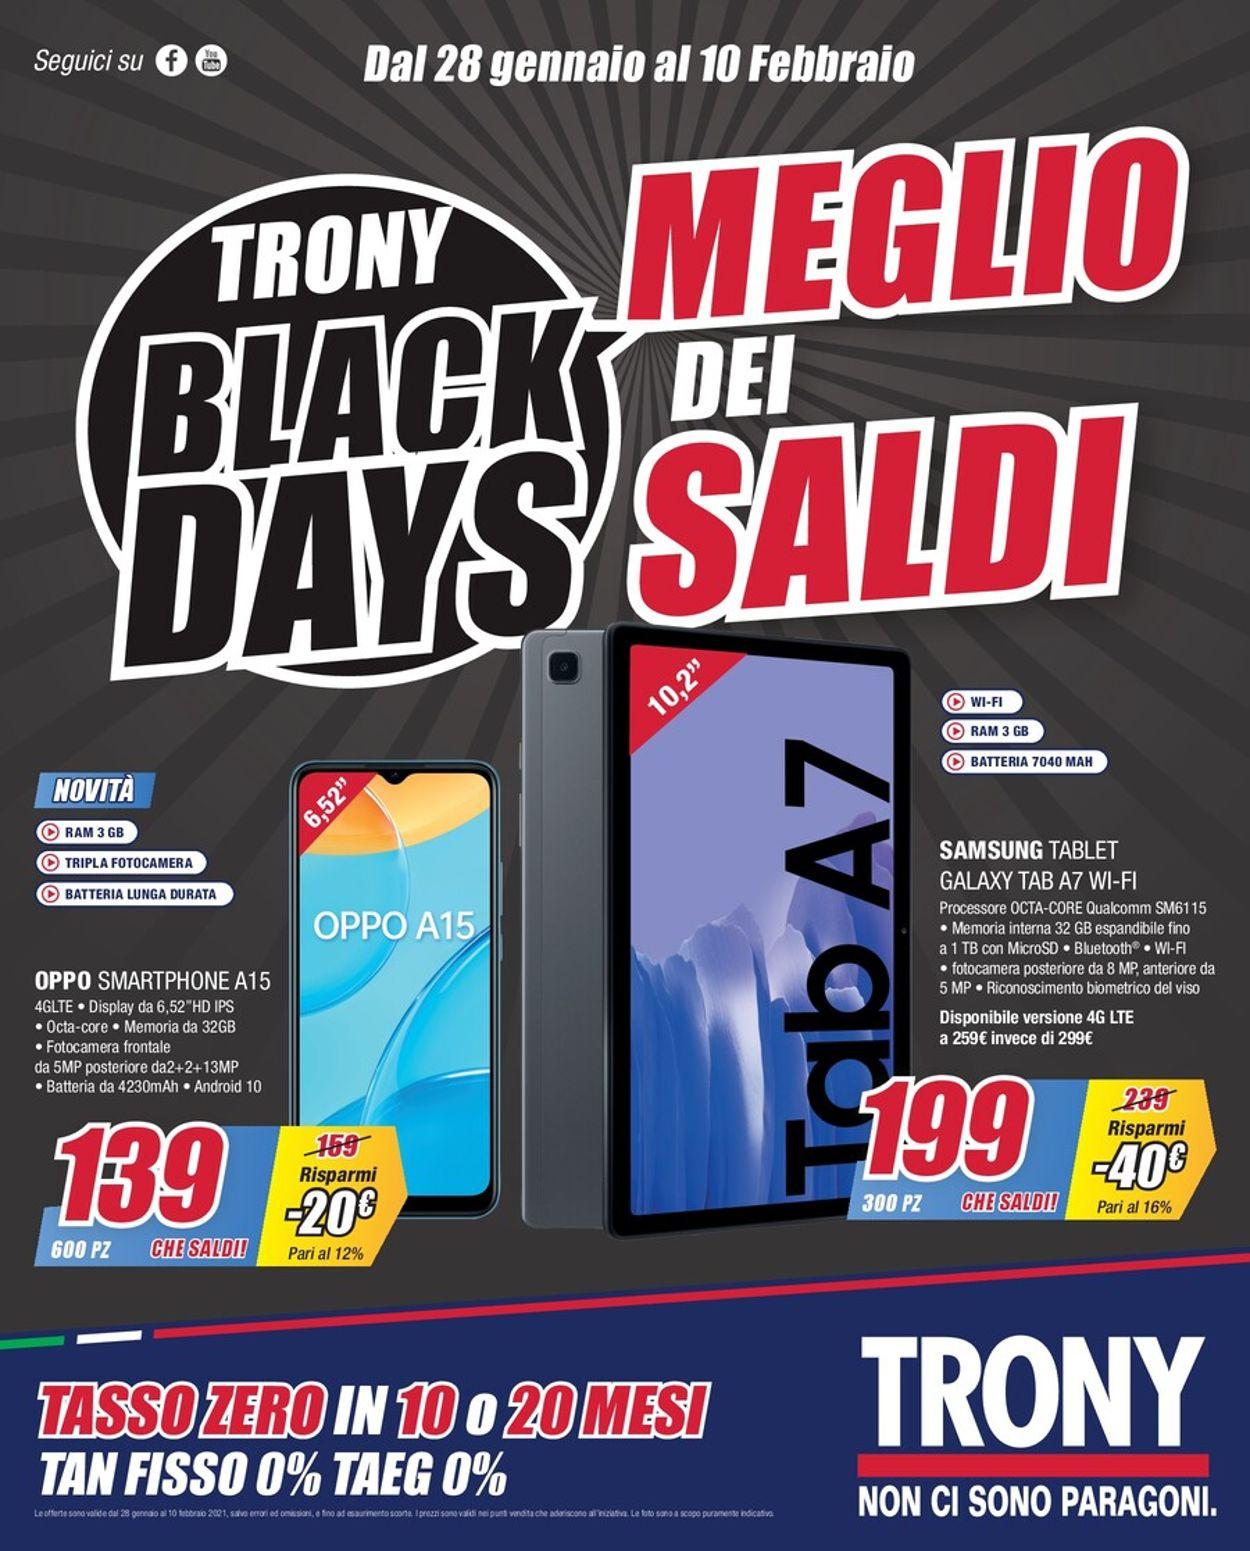 Volantino Trony - Black Days 2021 - Offerte 28/01-10/02/2021